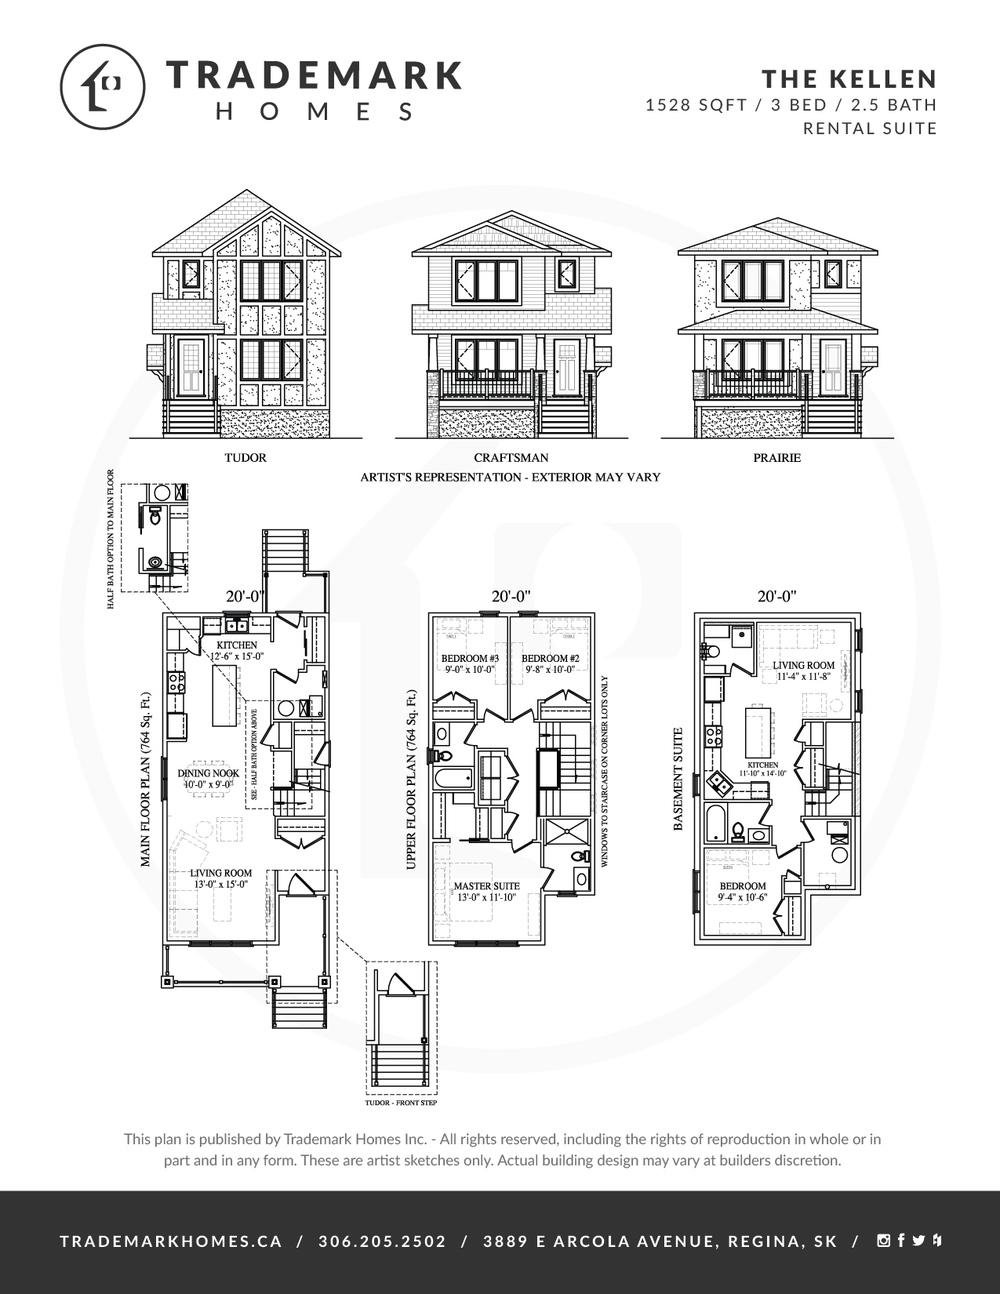 Trademark Homes The Kellen Lane Lot